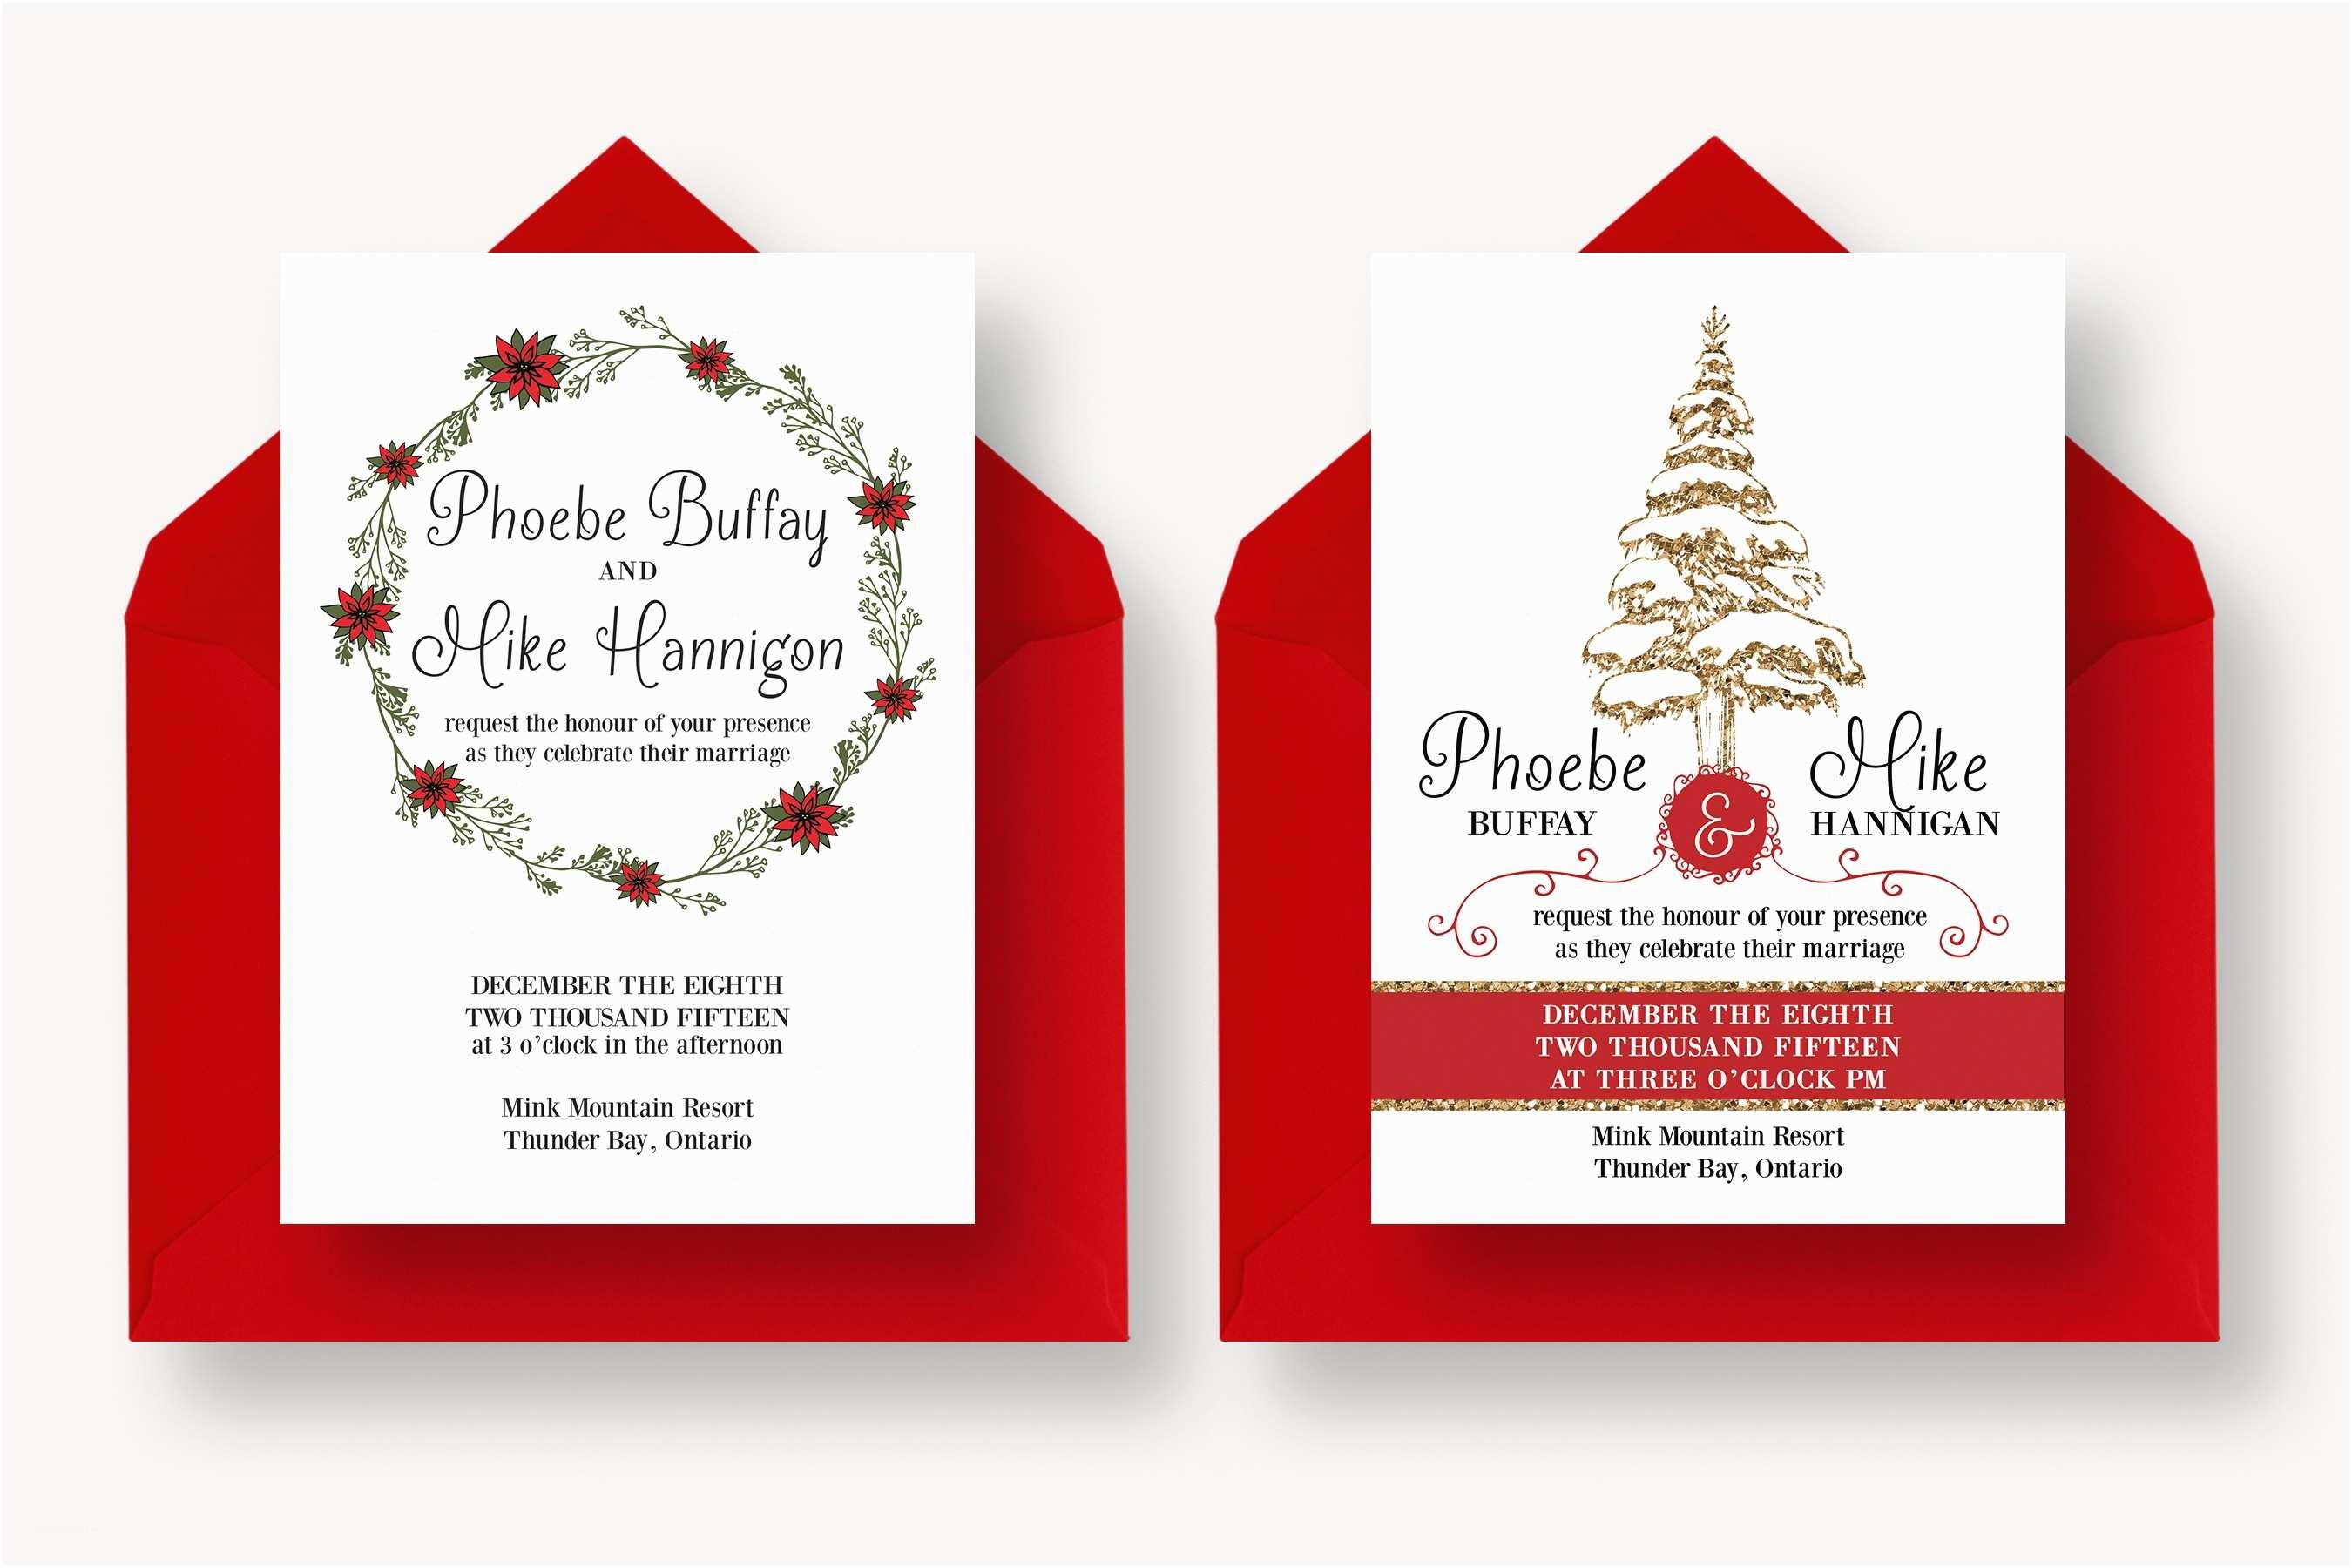 Winter Wedding Invitation Templates Winter Wedding Suite Invitation Templates On Creative Market